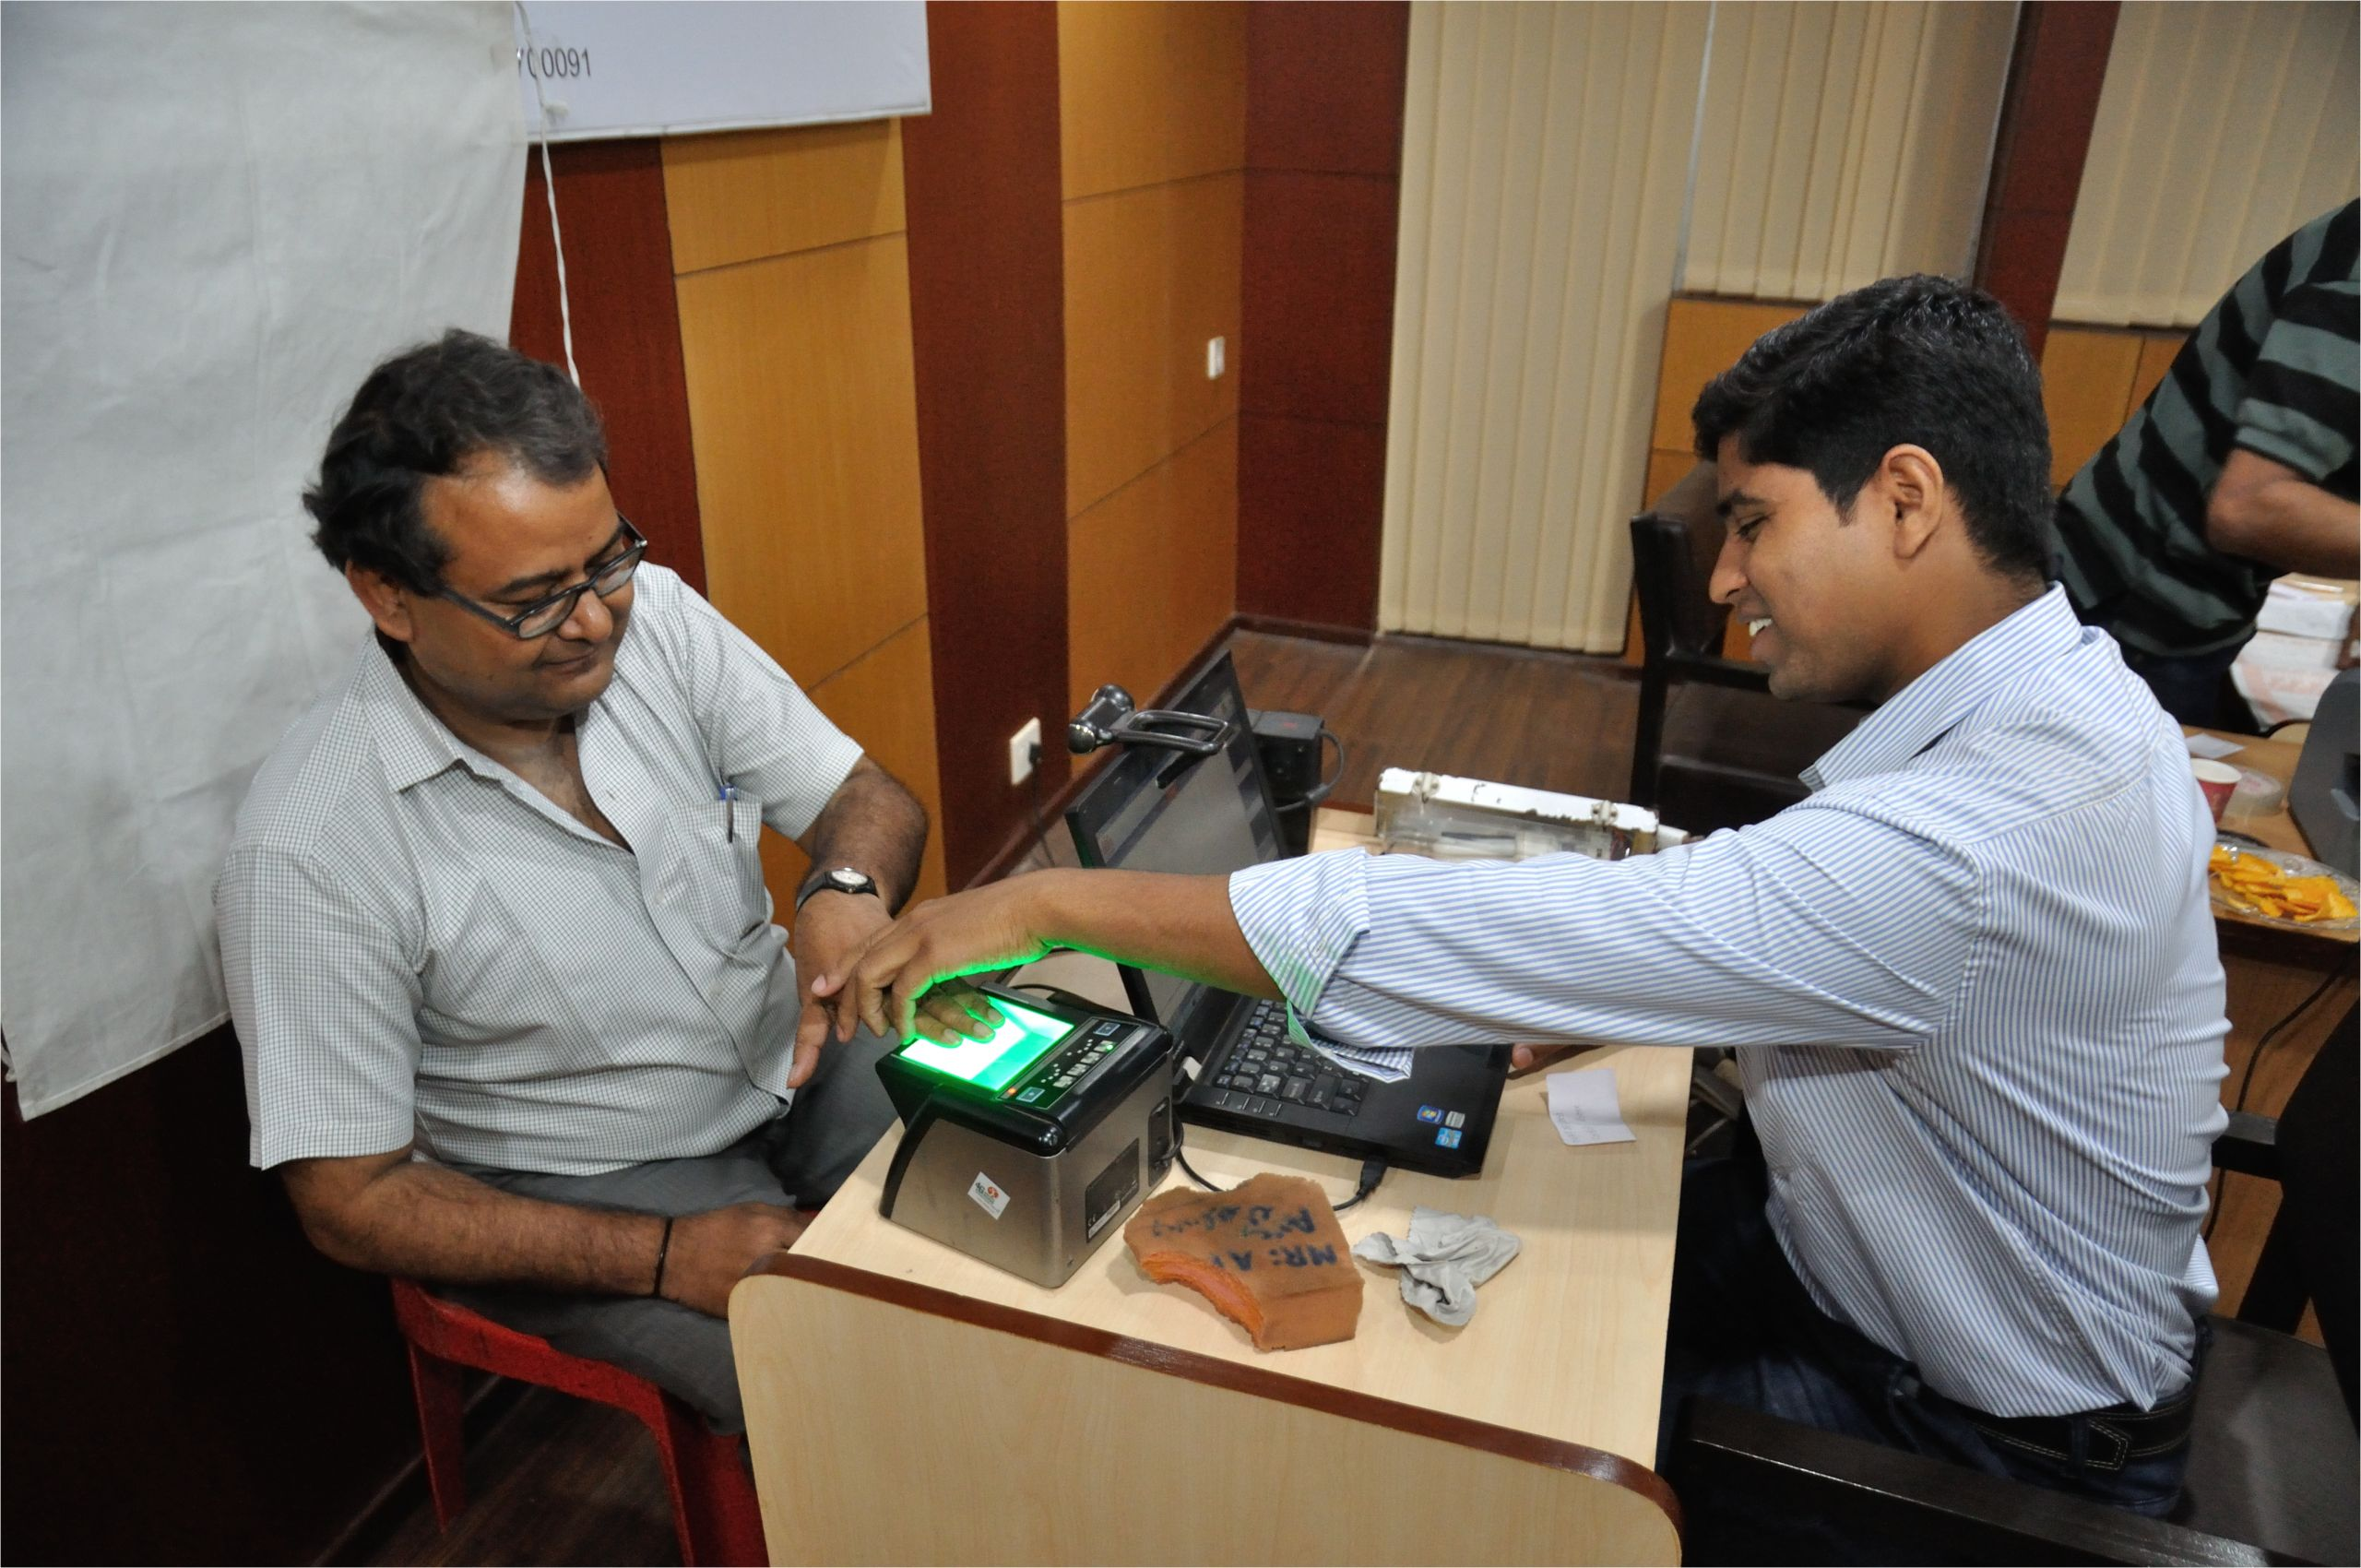 fingerprint scan biometric data collection aadhaar kolkata 2015 03 18 3660 jpg